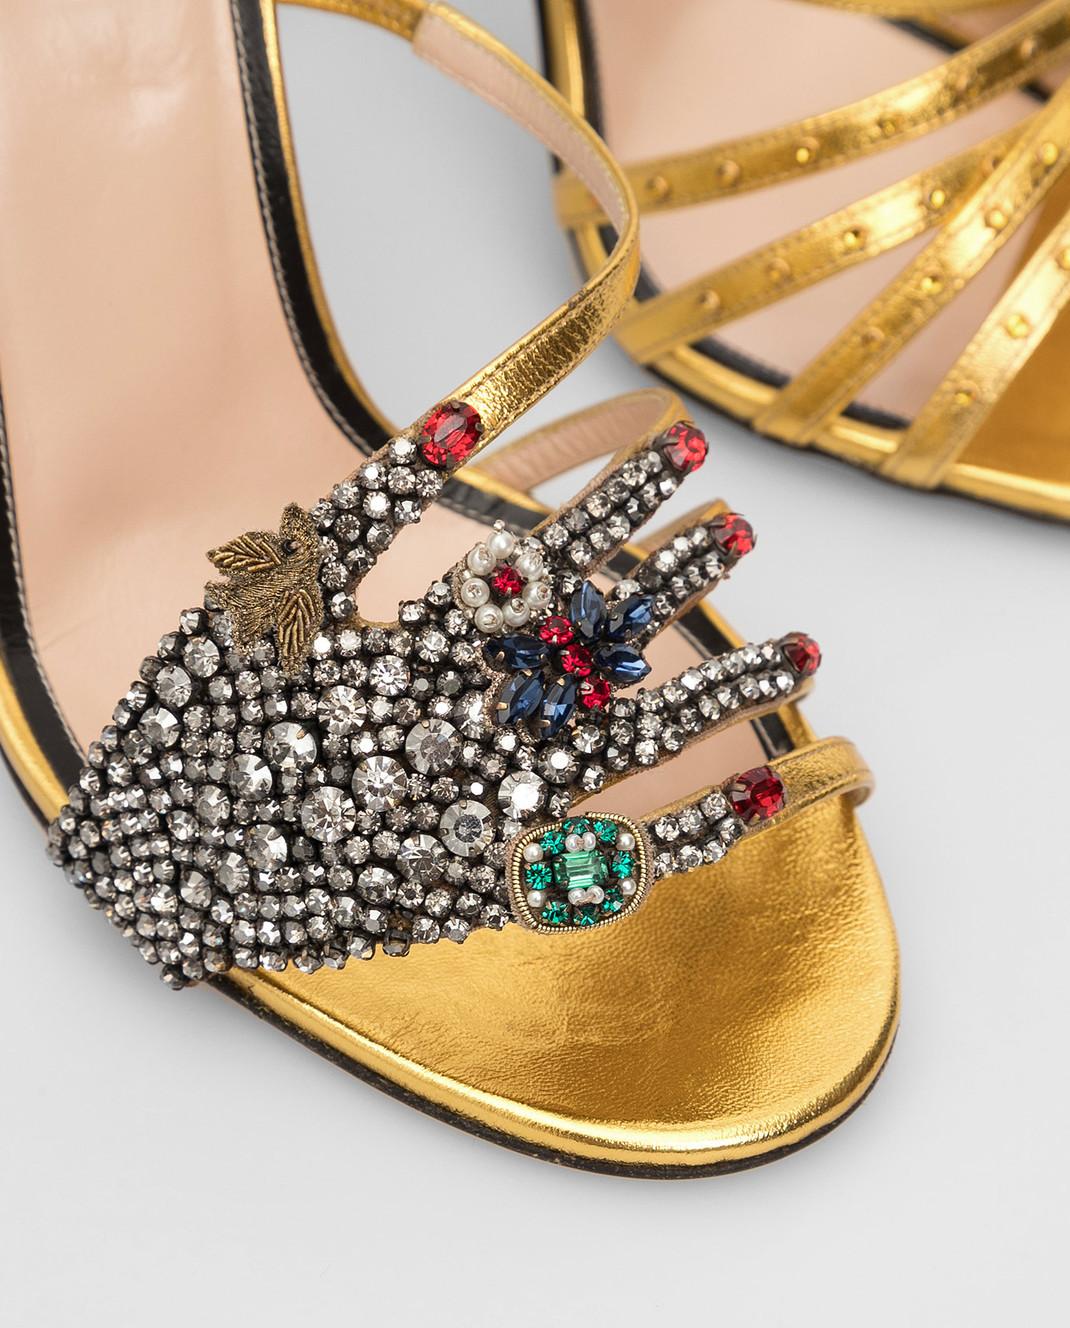 Gucci Босоножки с кристаллами 452770 изображение 5